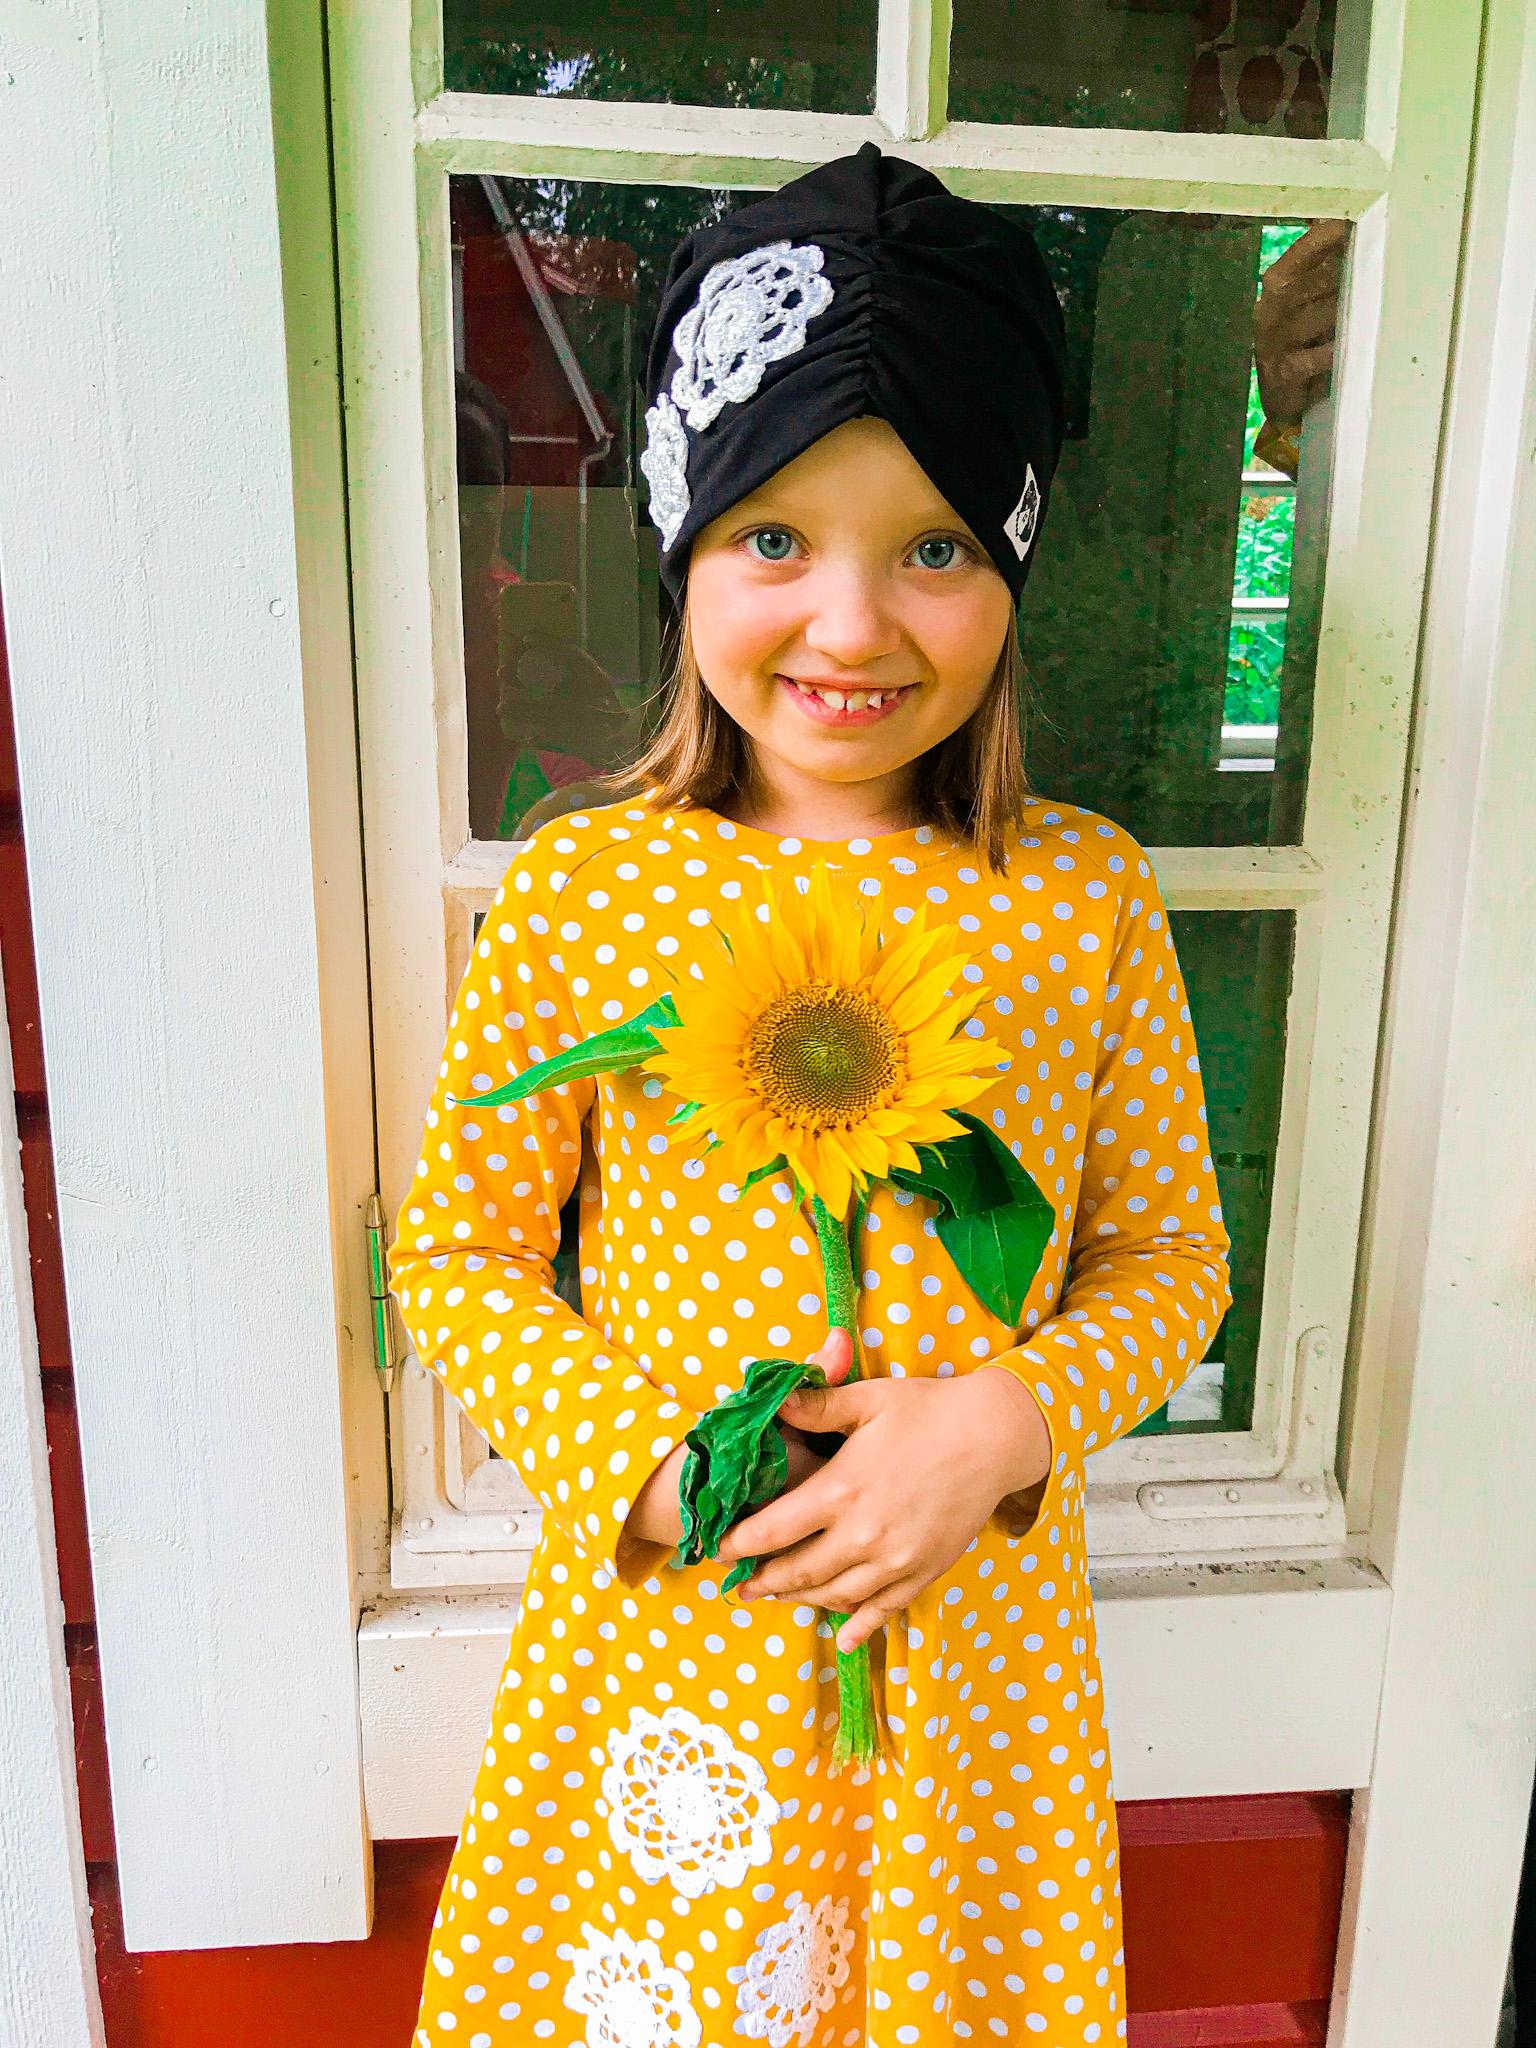 YellowQuu ja auringonkukat